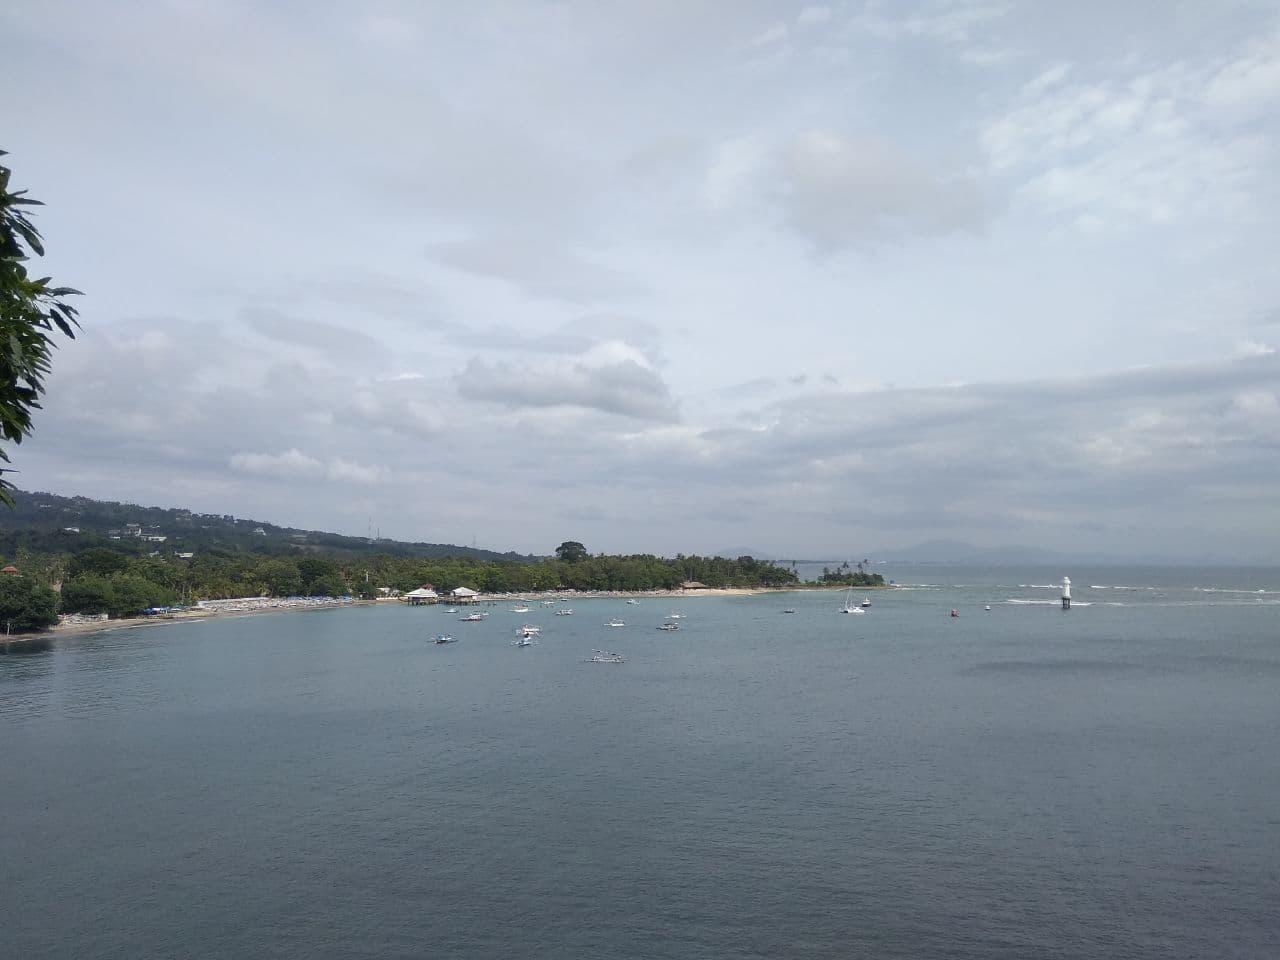 Pantai Paling dekat di kota mataram